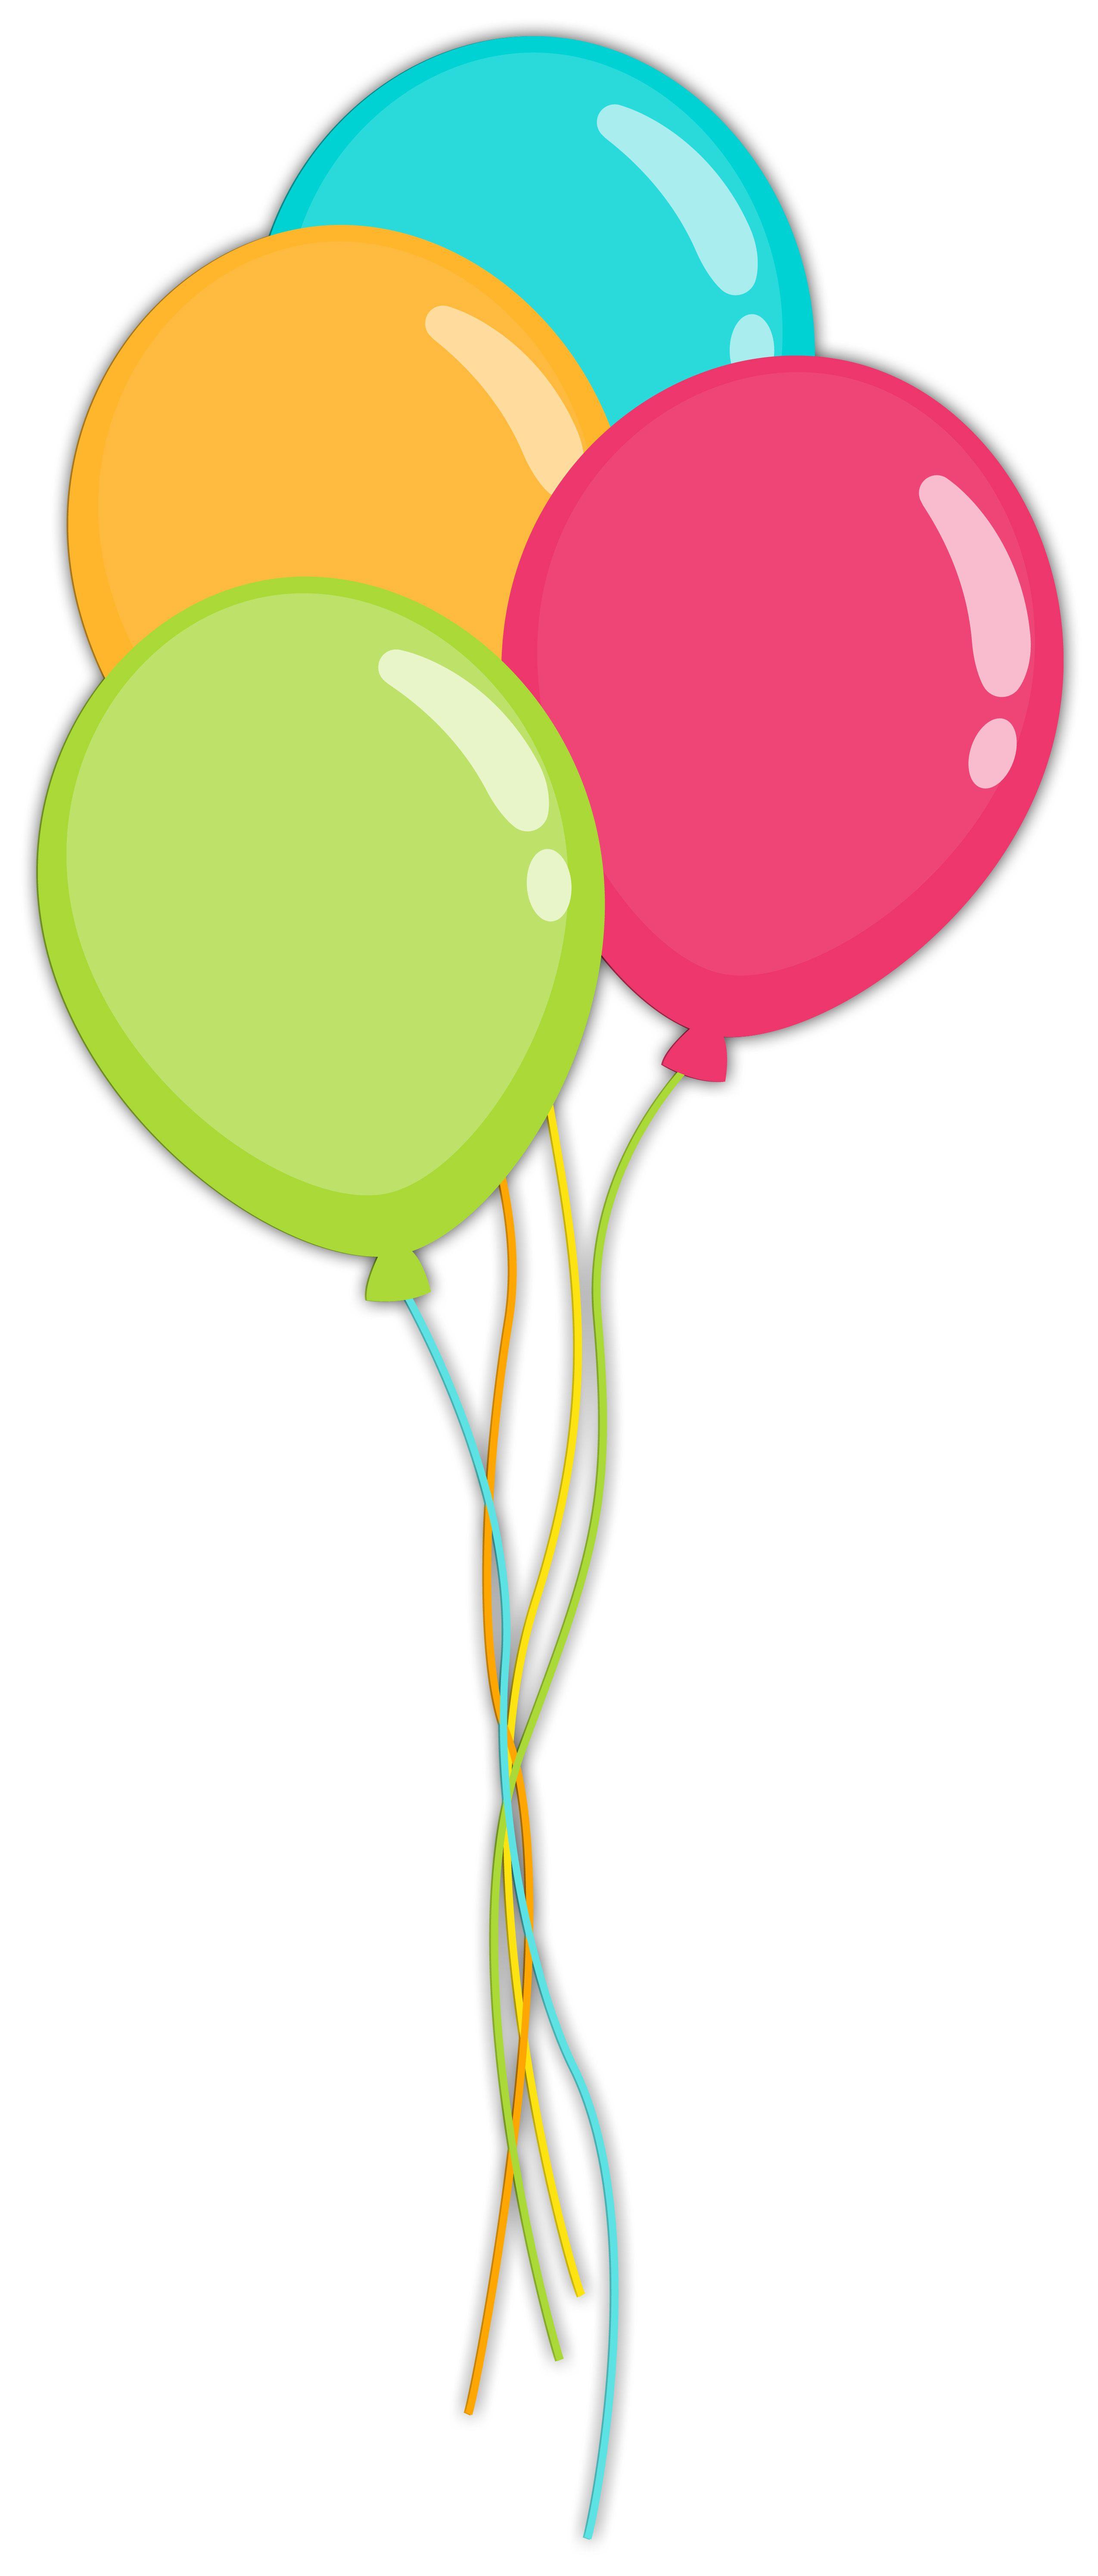 balloons clip art [ 2549 x 5981 Pixel ]